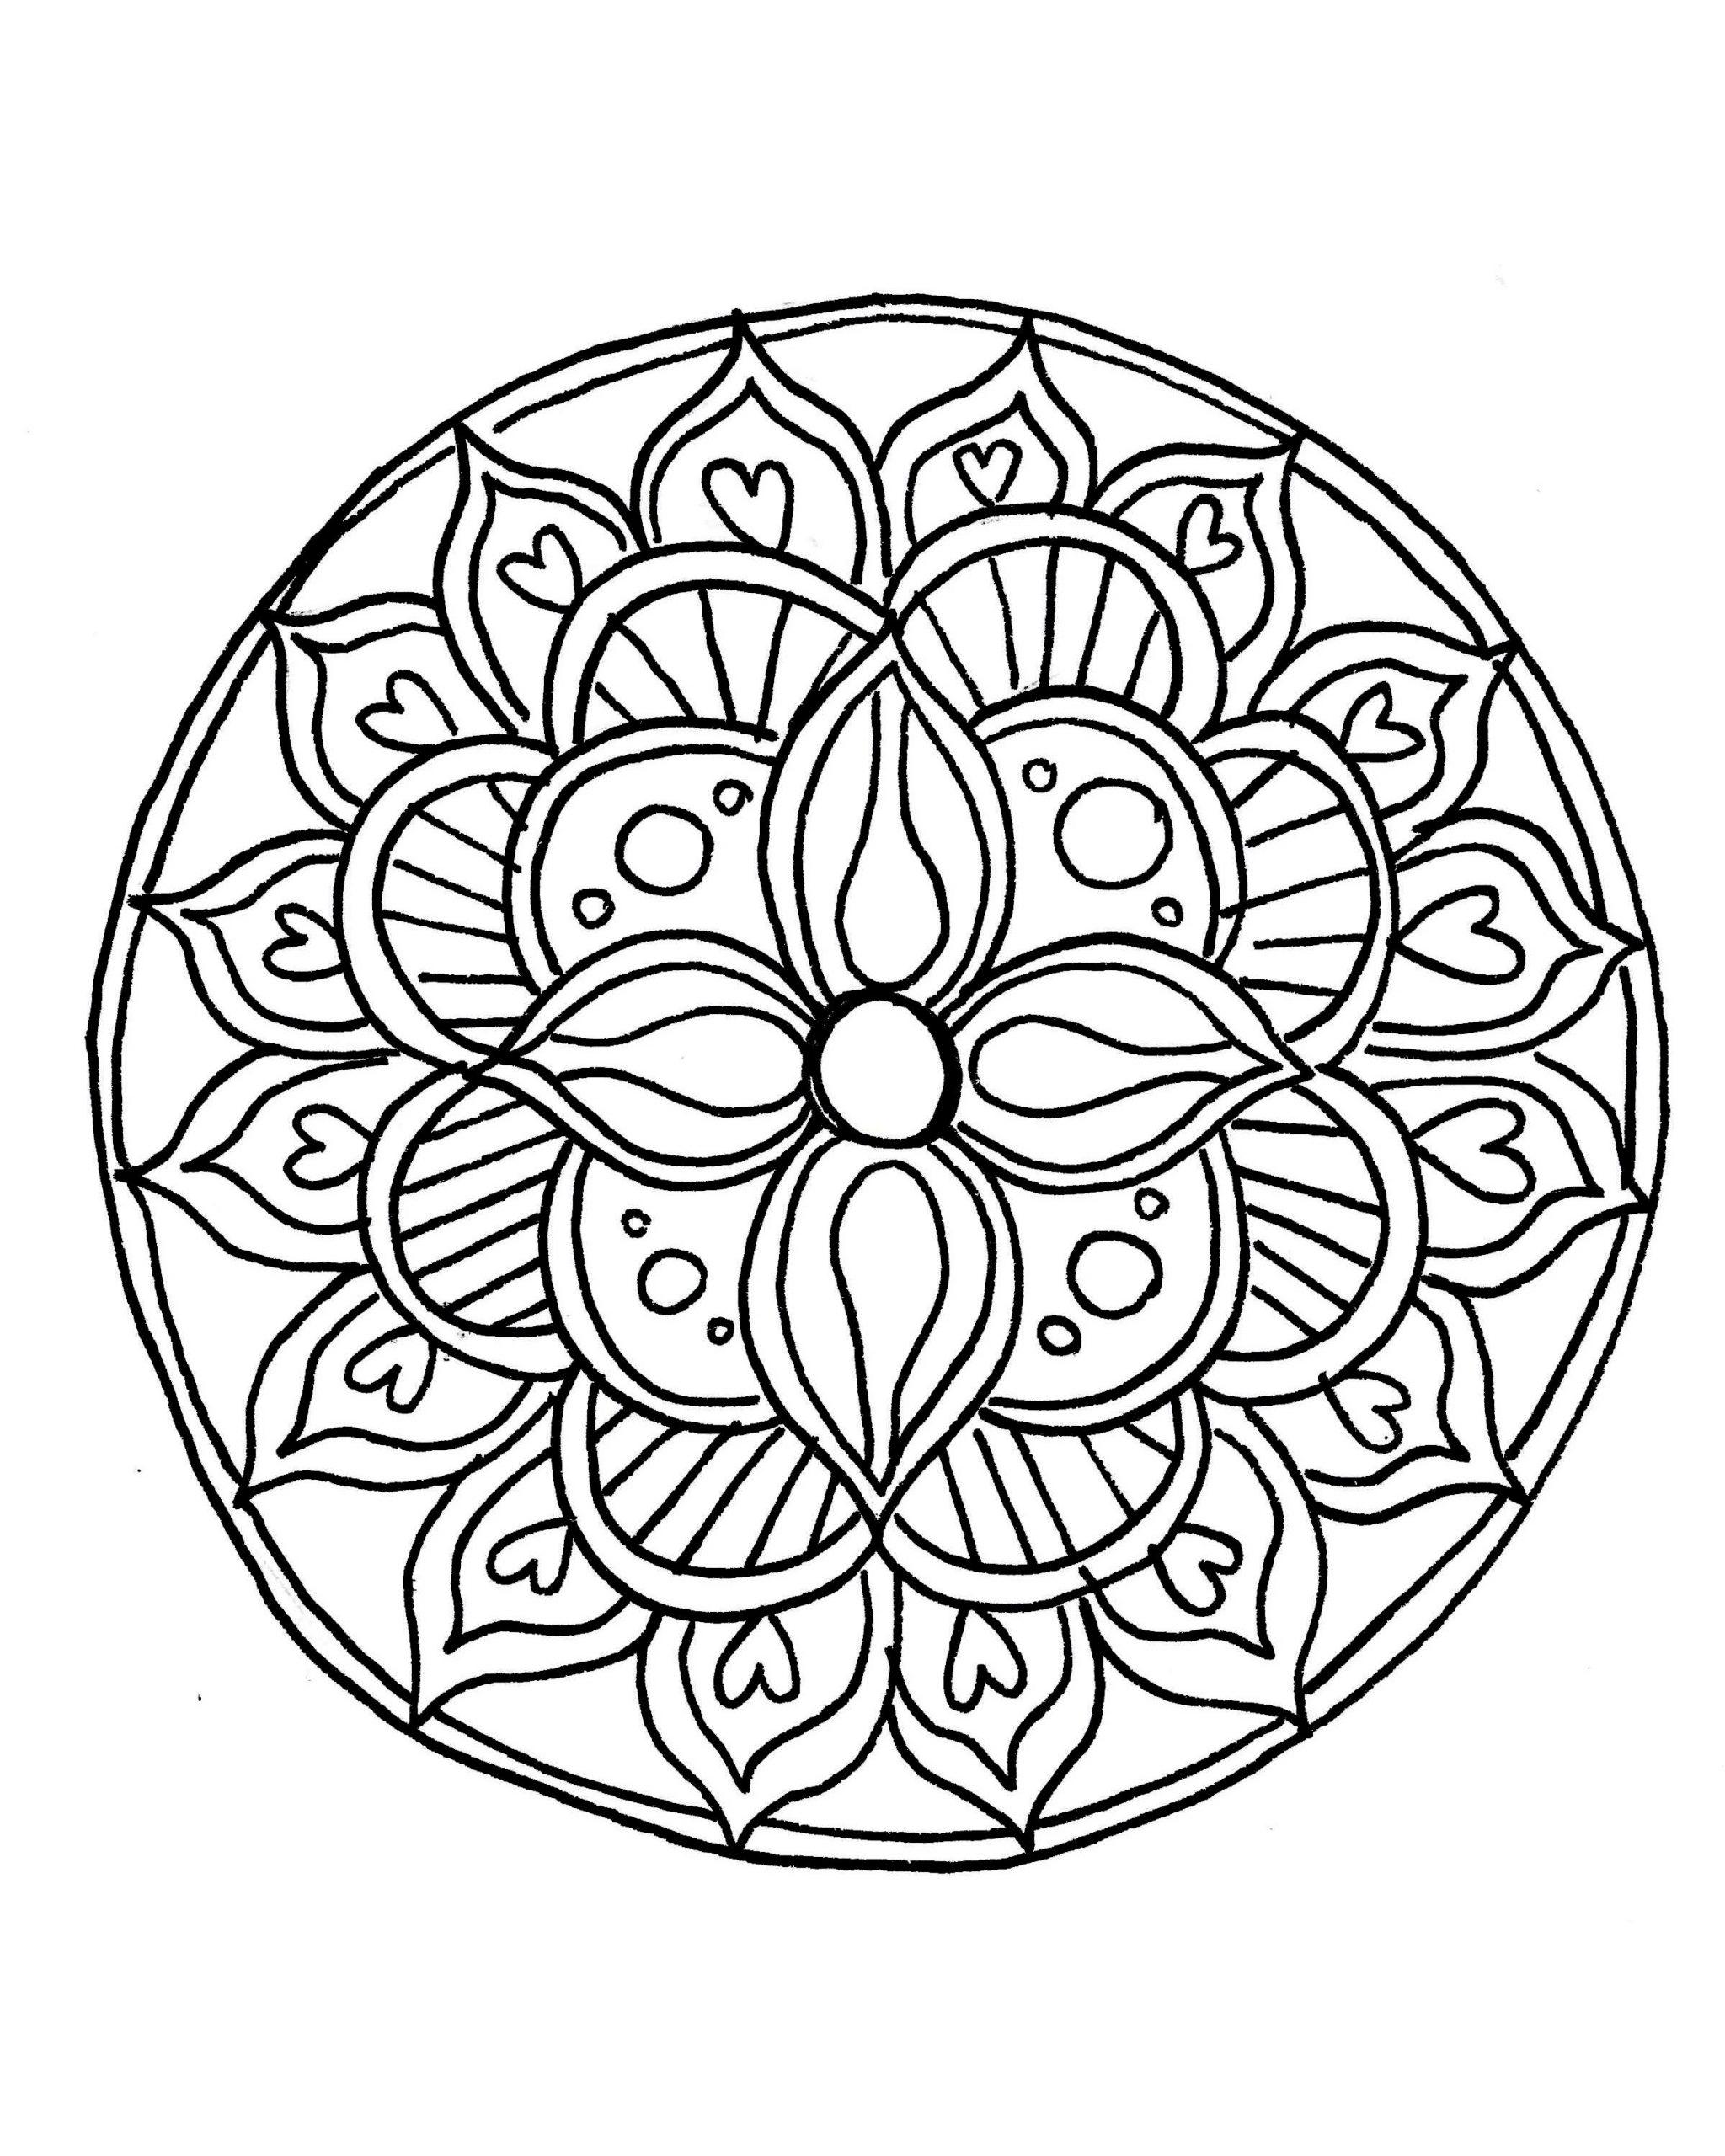 Draw A Mandala Freehand! | Mandala Coloring Pages, Simple à Mandala Fée